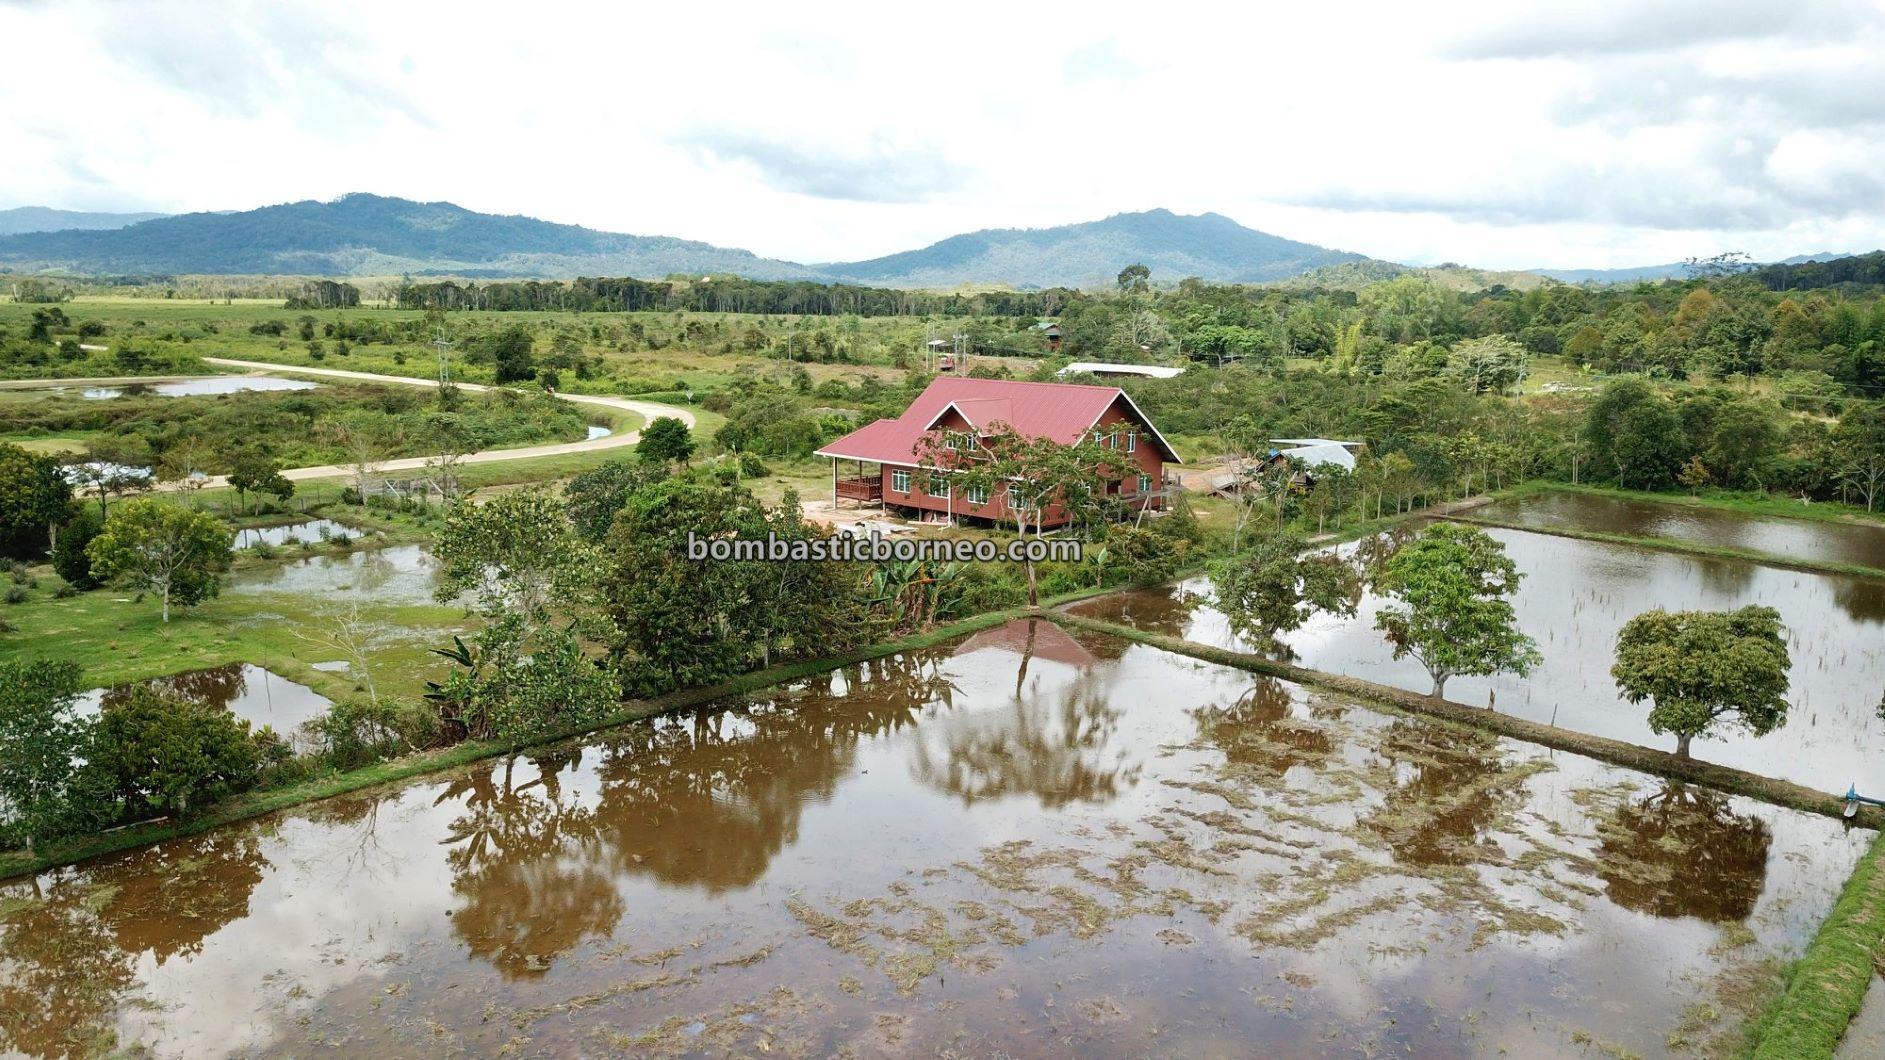 Bario, Kelabit Highlands, traditional, authentic, backpackers, exploration, Interior village, native, dayak, Malaysia, Sarawak, Tourism, travel guide, Trans Border, Borneo,